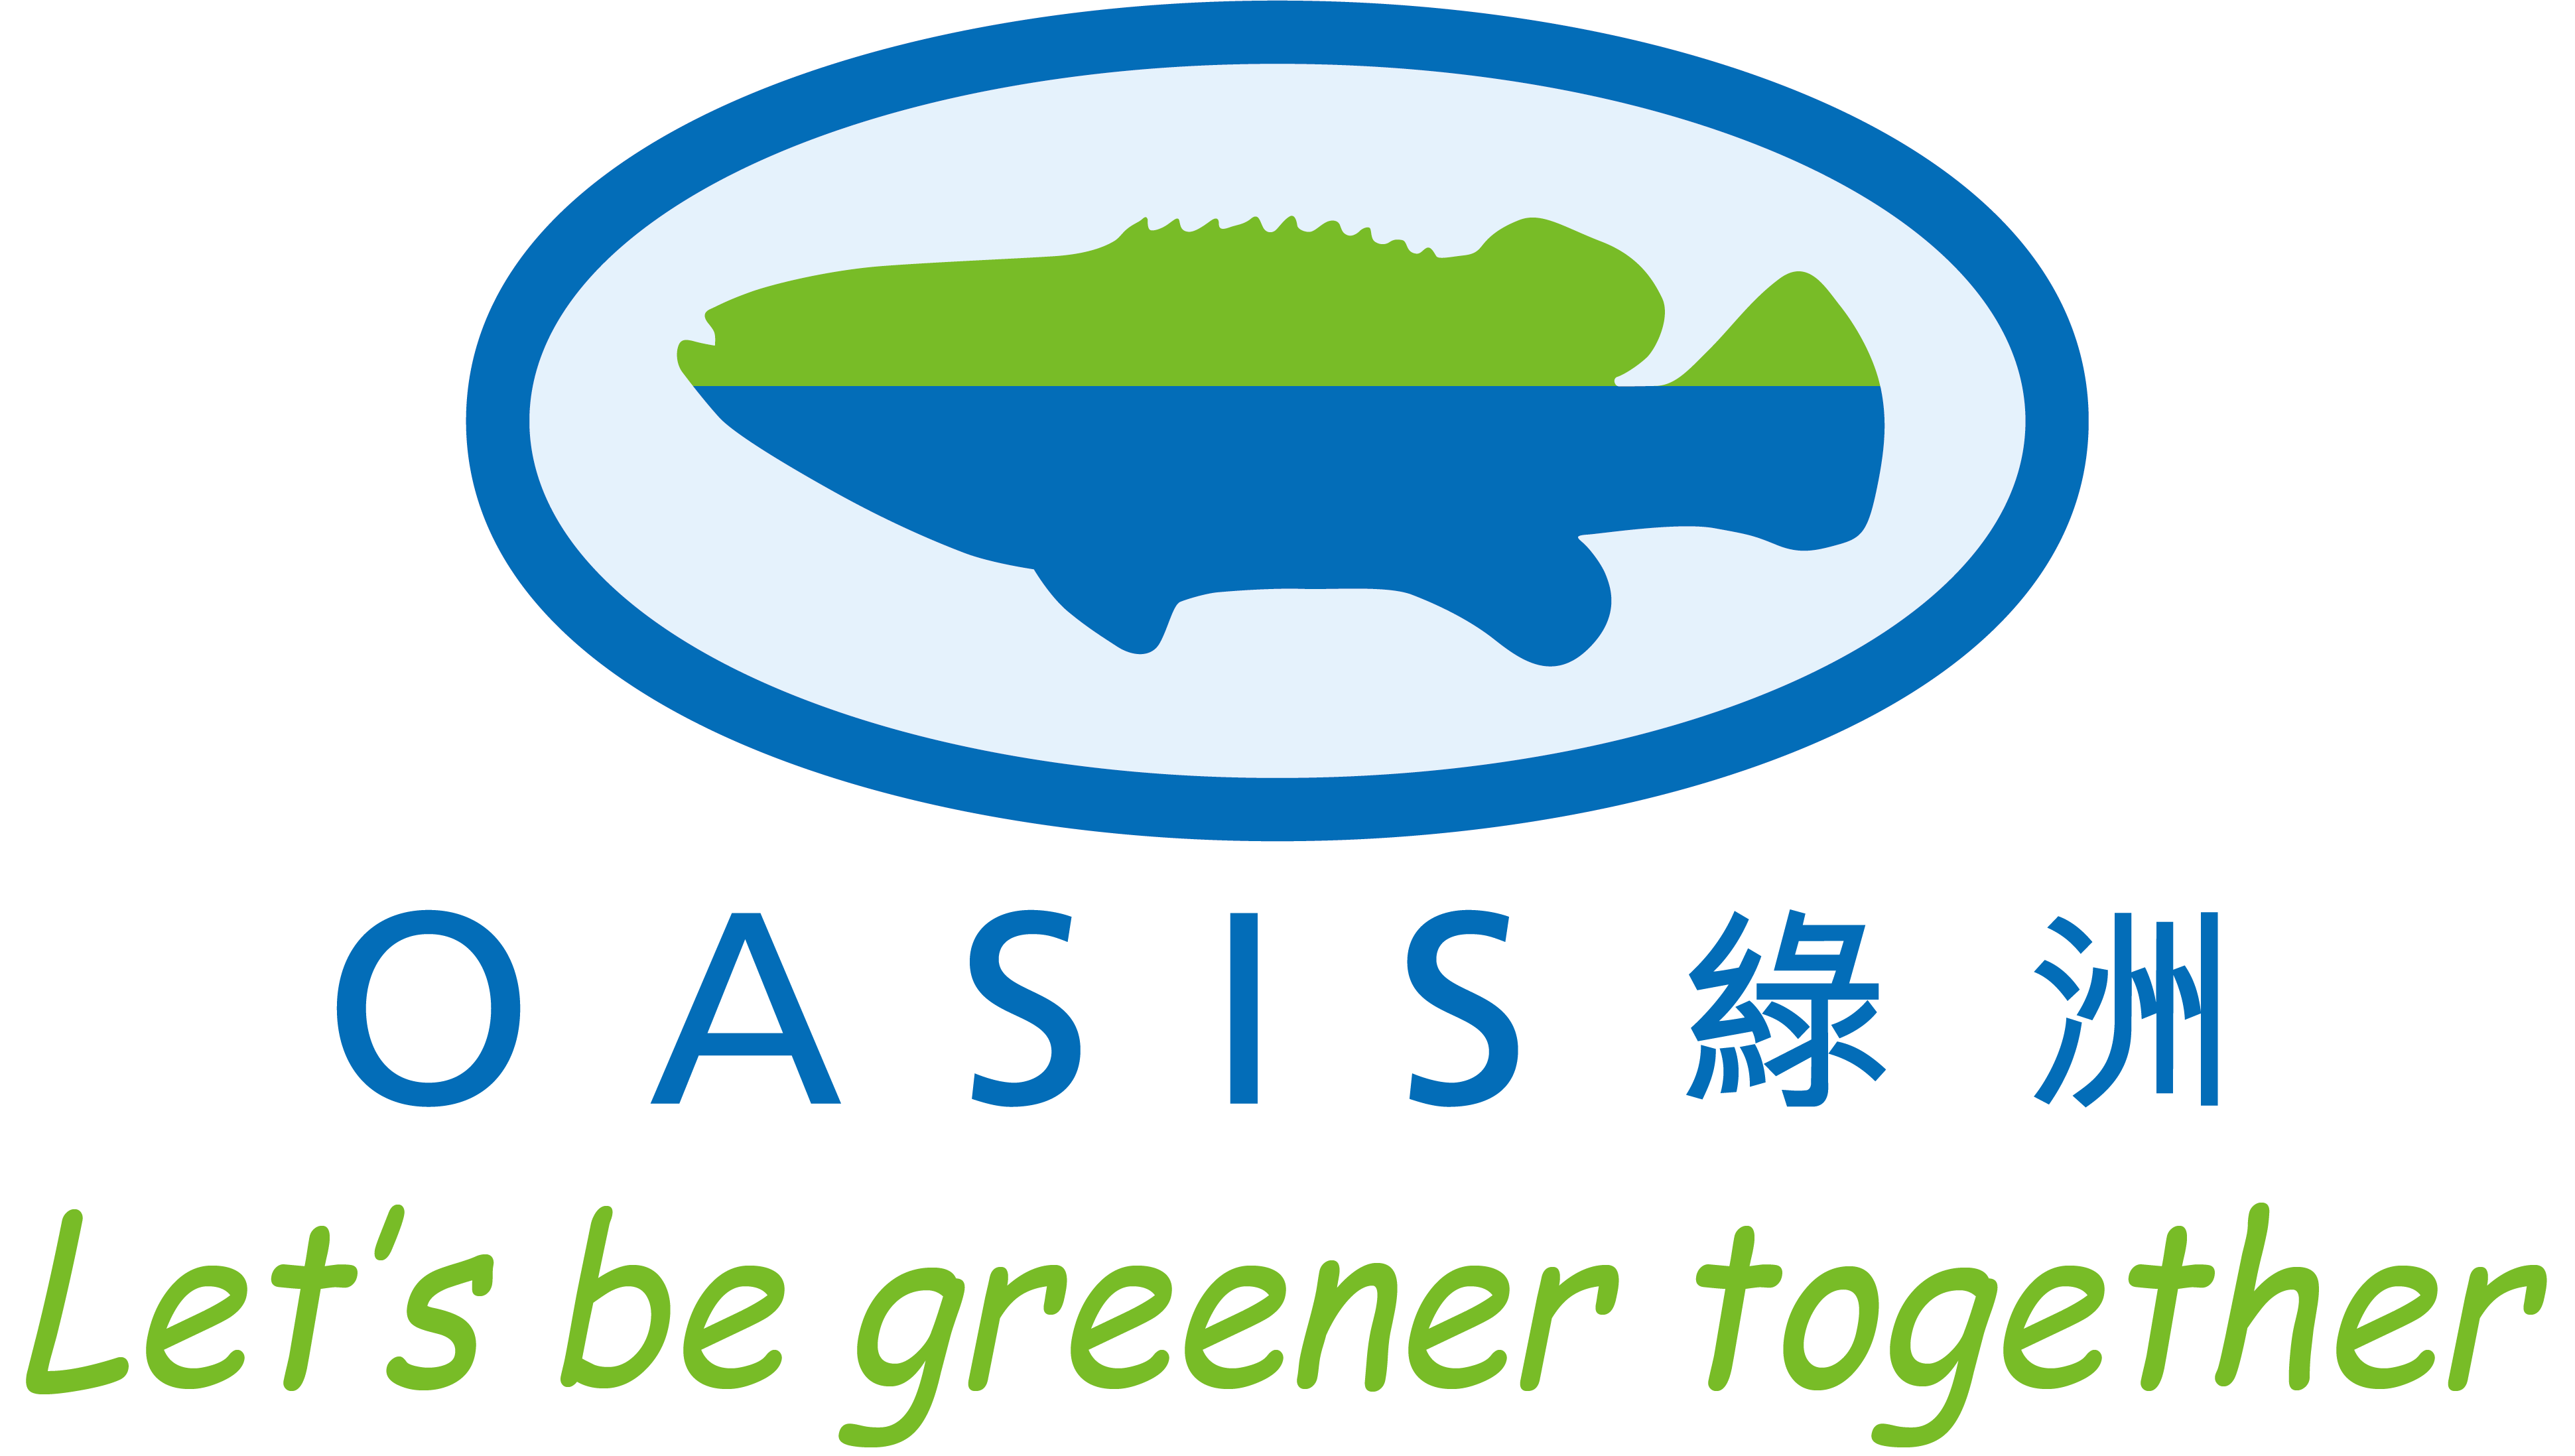 http://www.aquatechasia.hk/